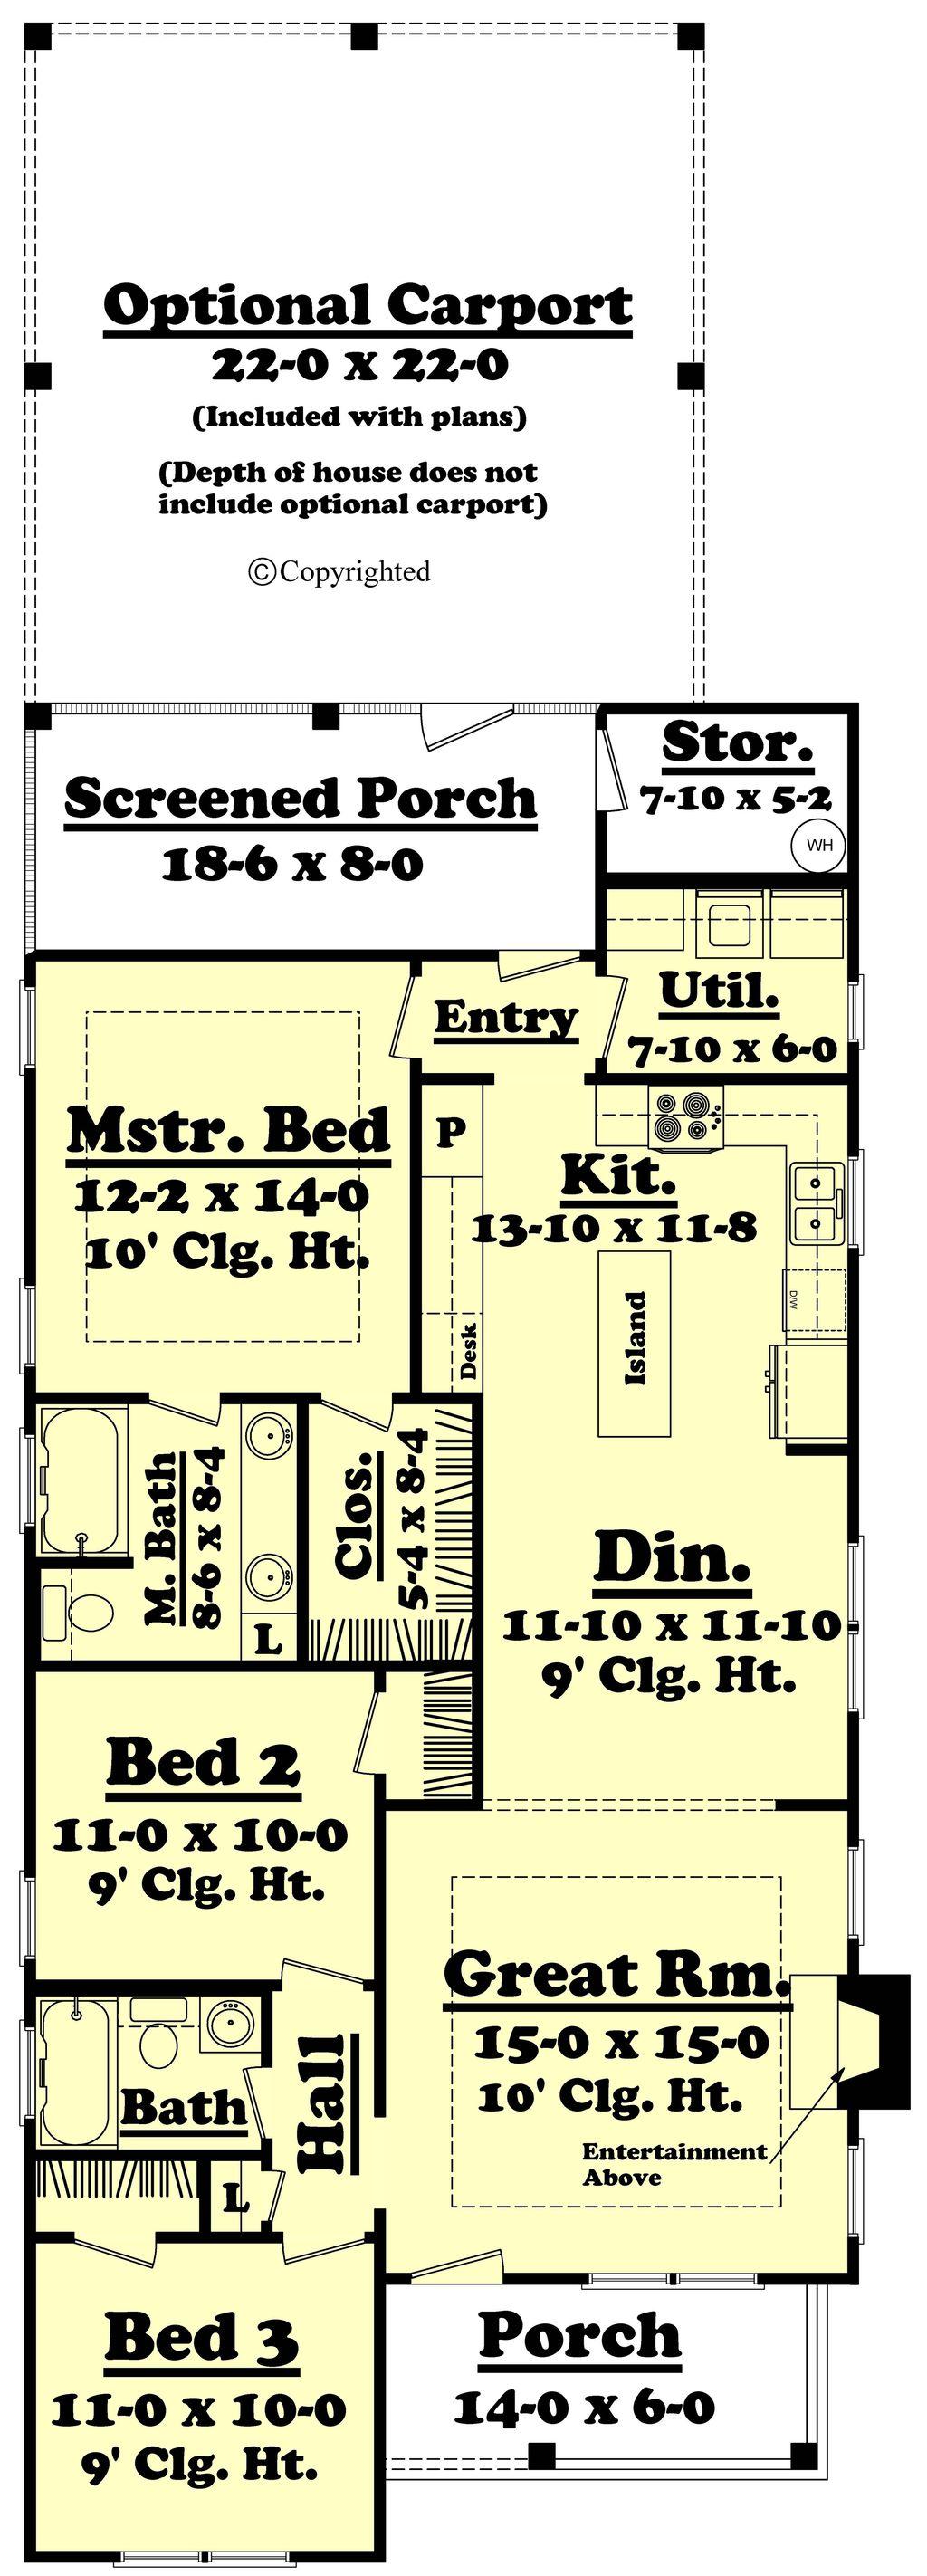 Cottage Style House Plan 3 Beds 2 Baths 1300 Sq Ft Plan 430 40 Houseplans Com